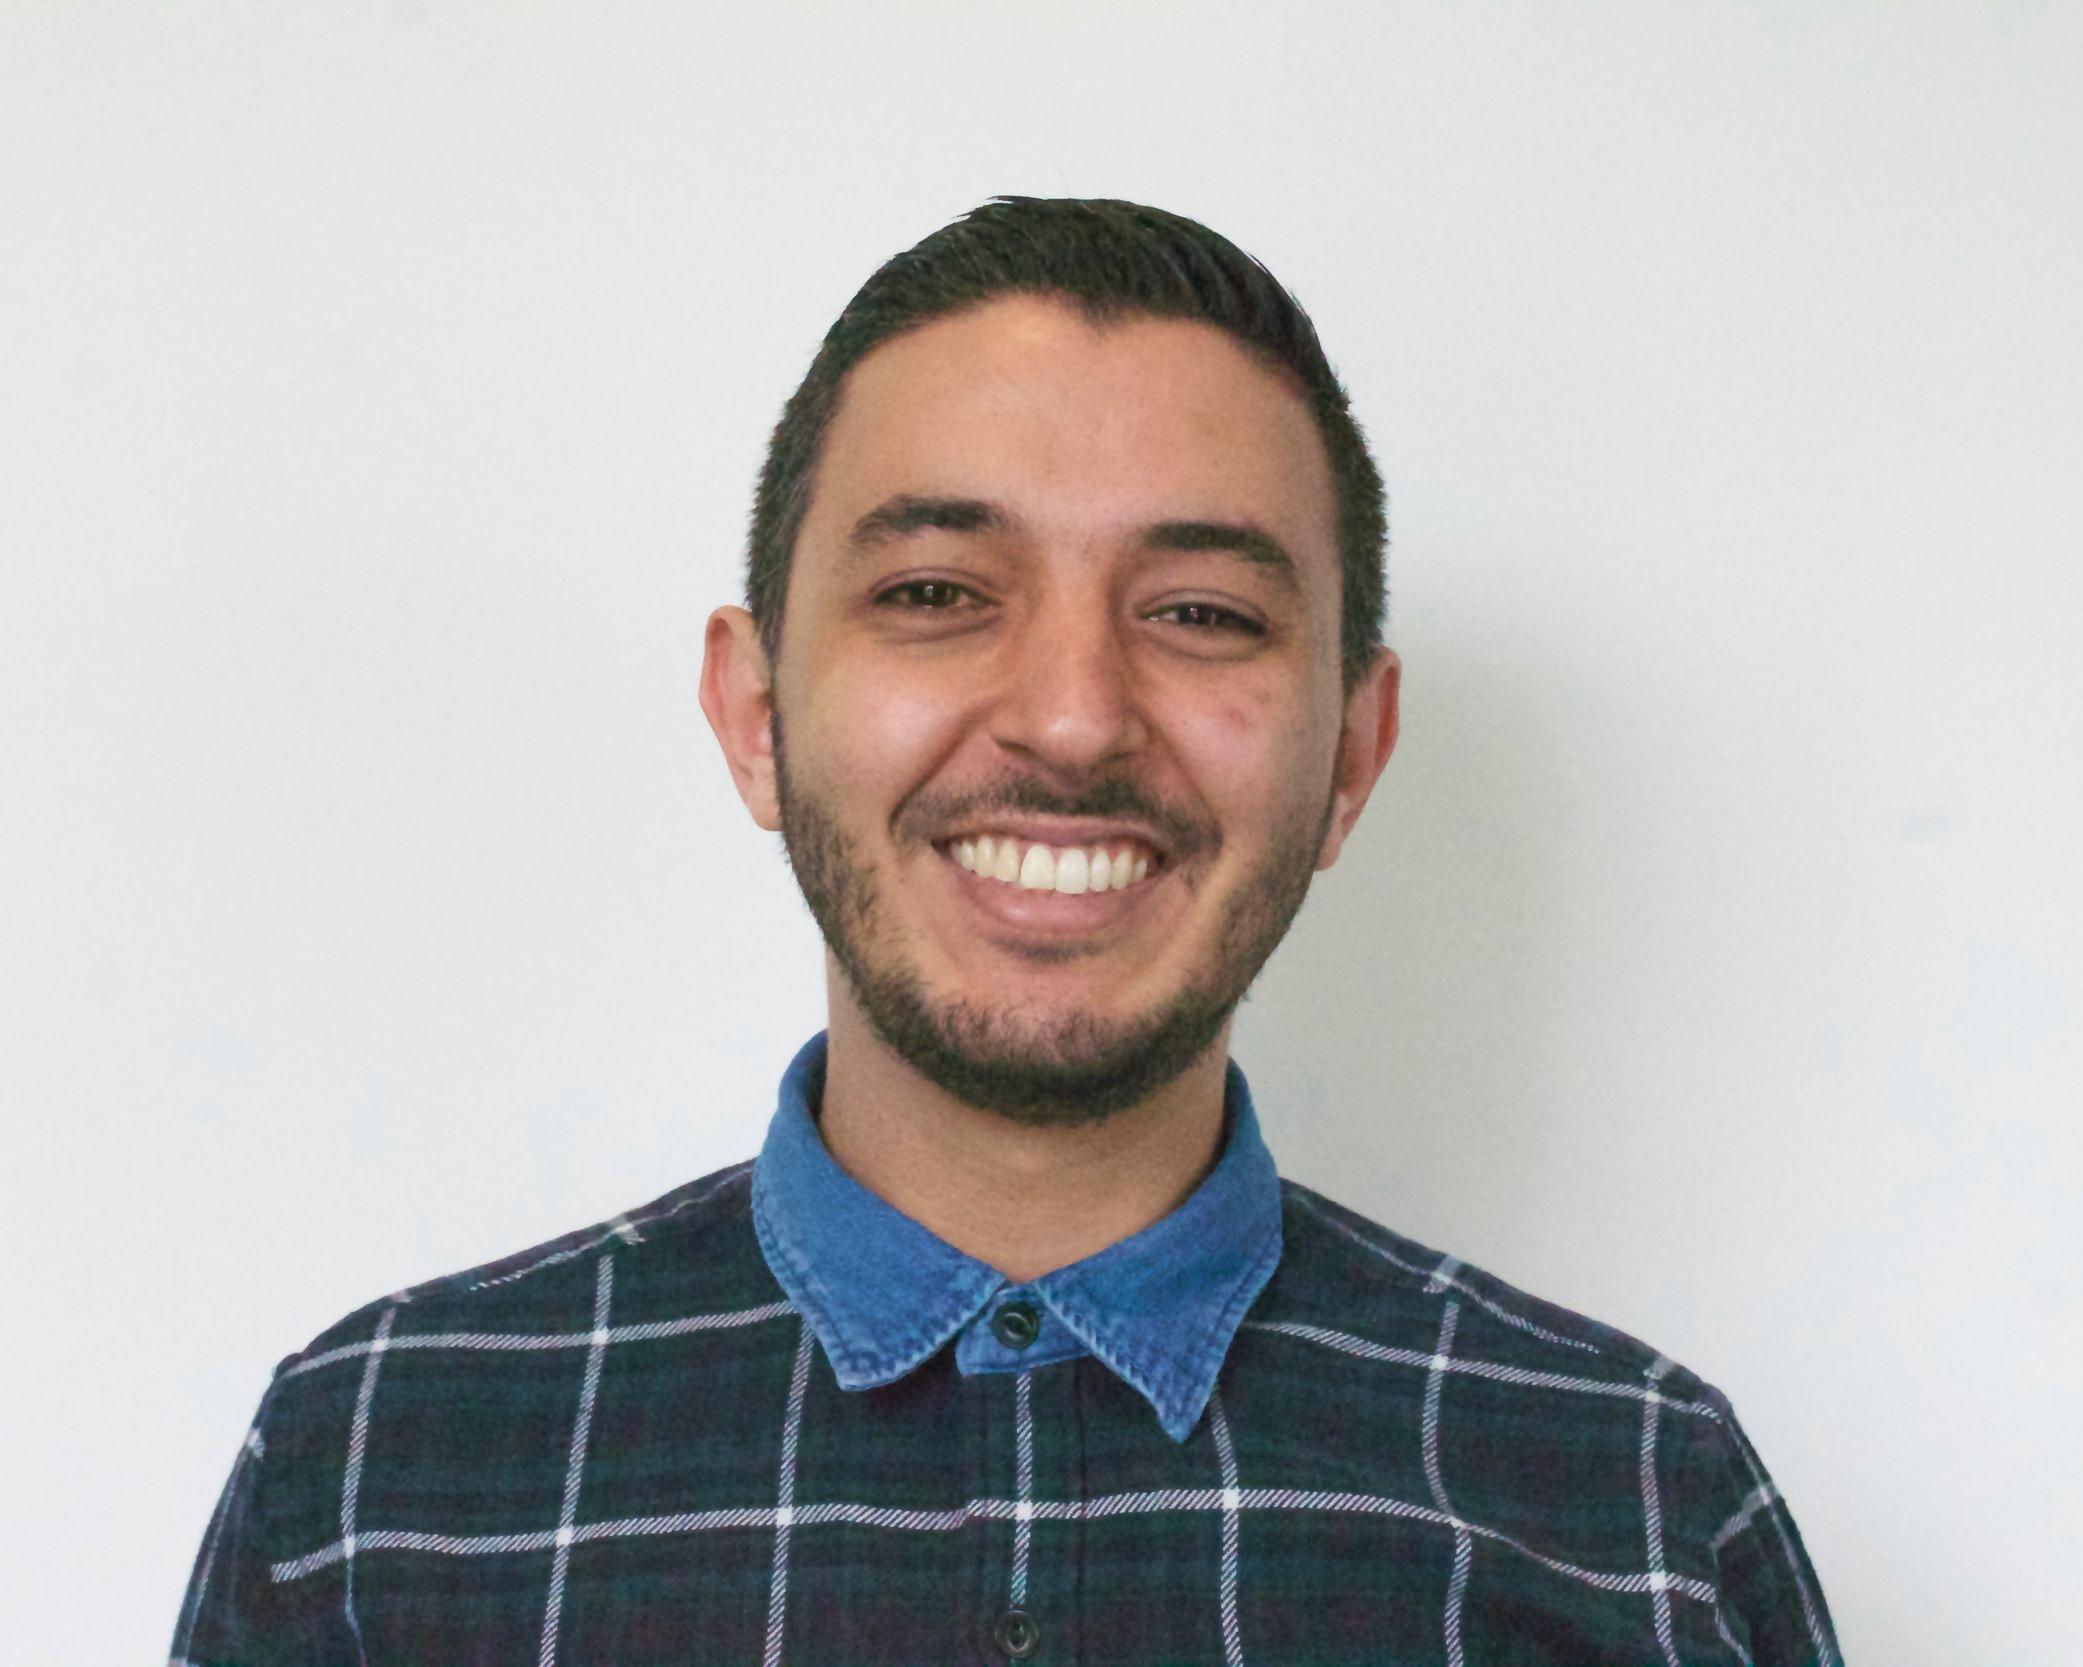 Bilal Tahraoui Tekenaar constructeur